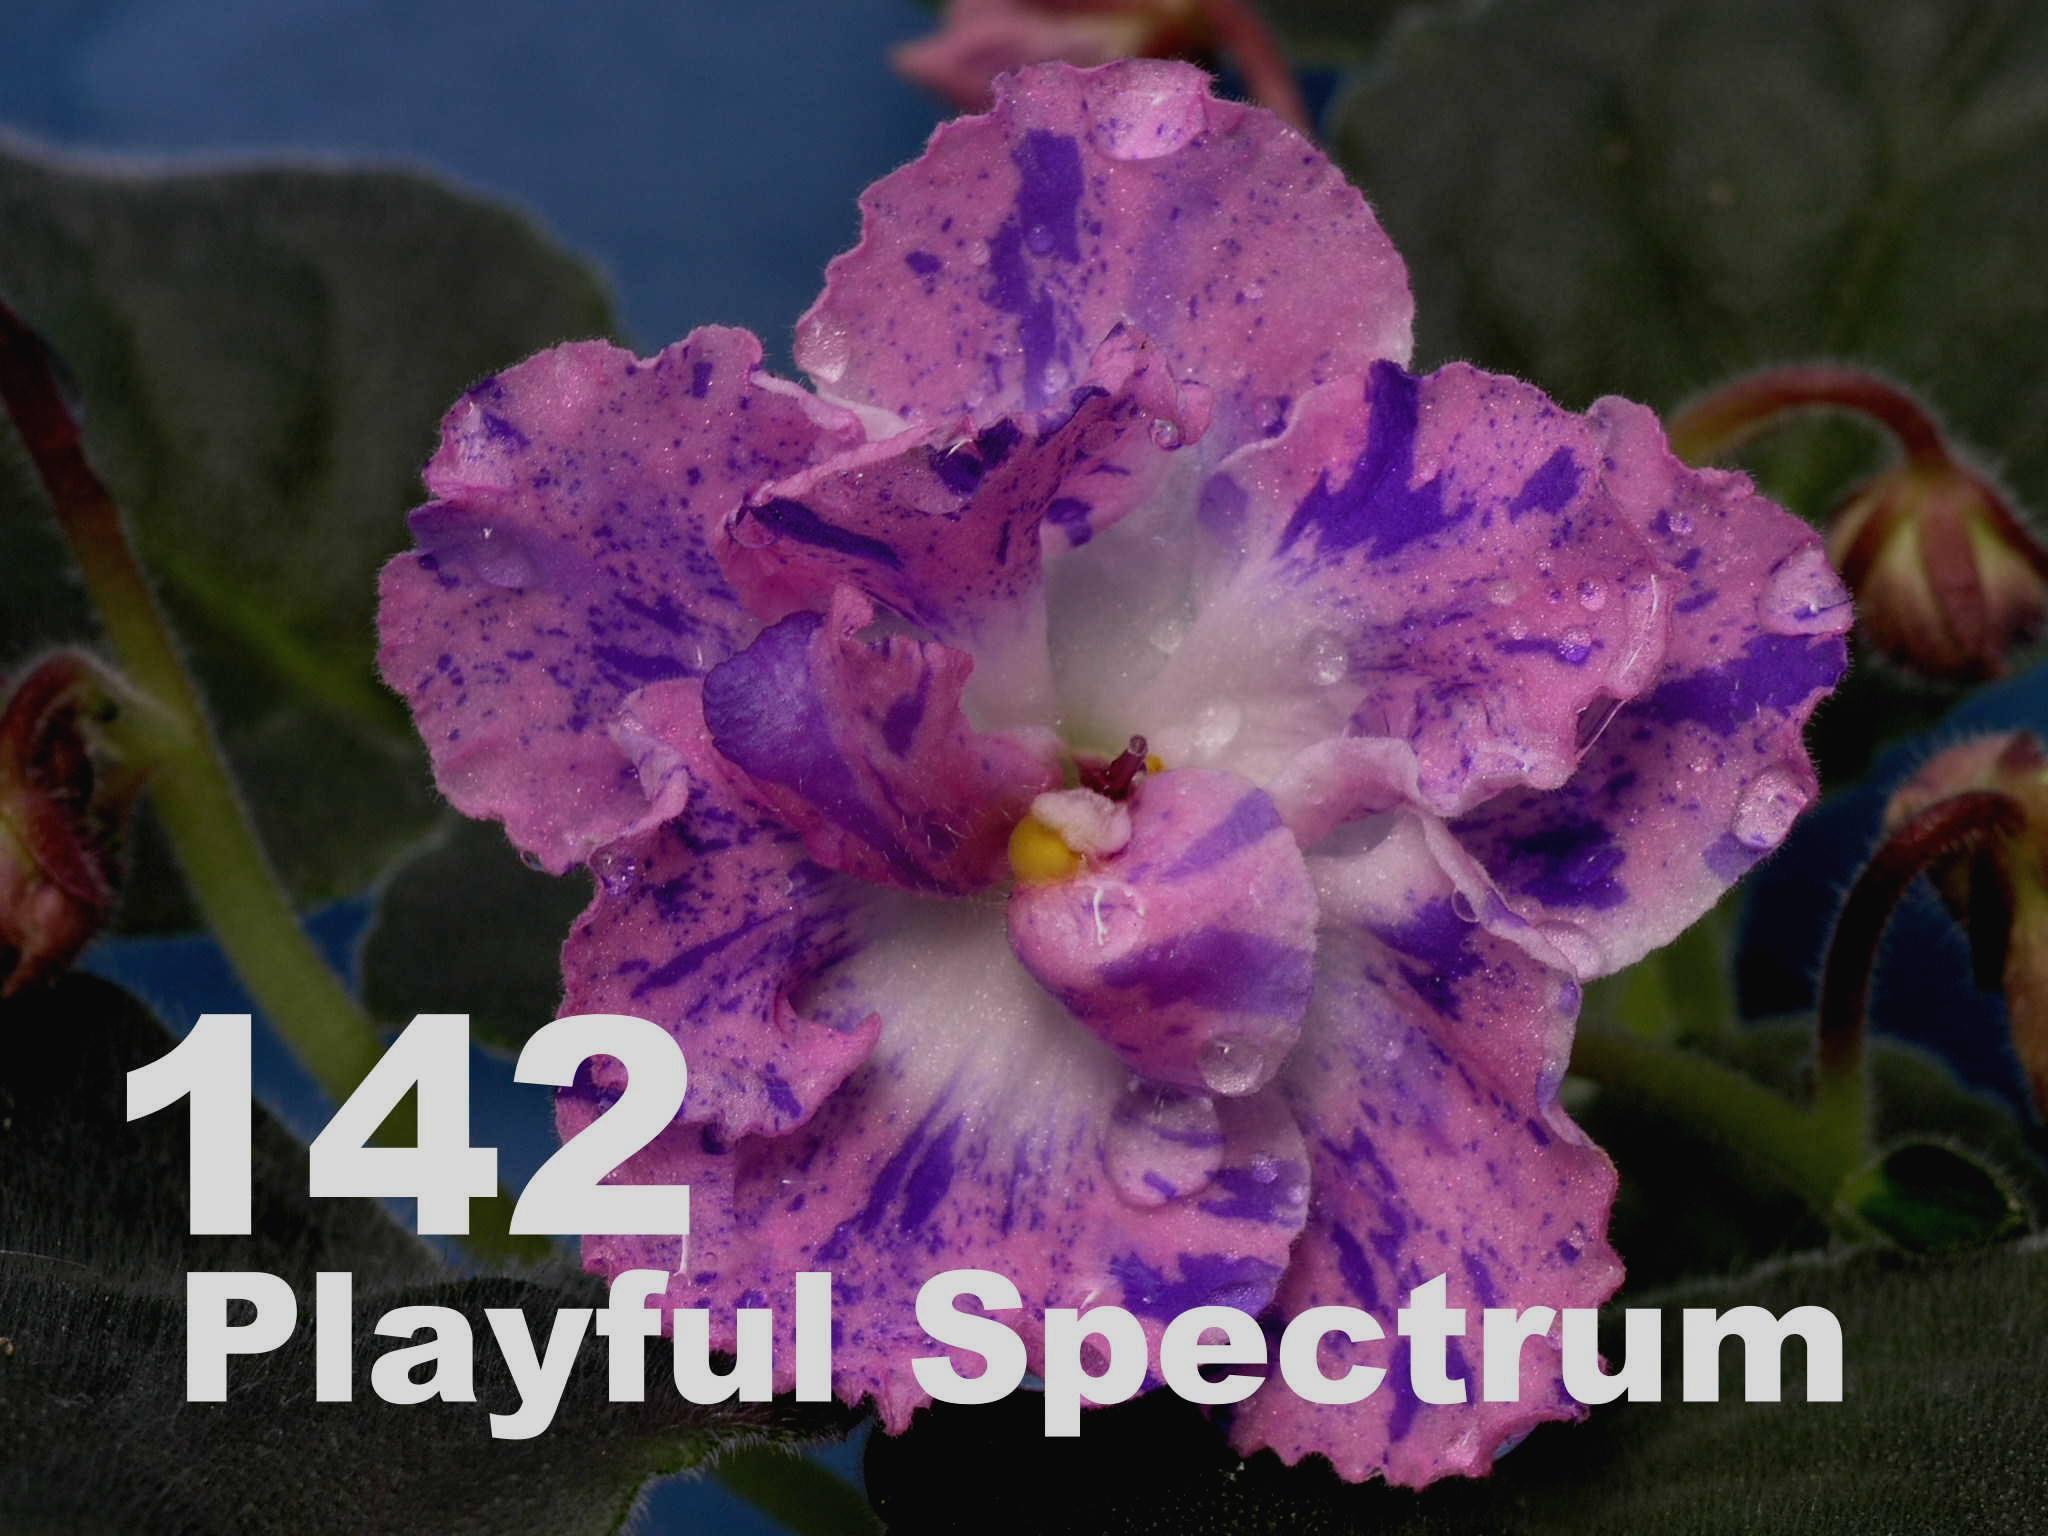 [142] Playful Spectrum 142